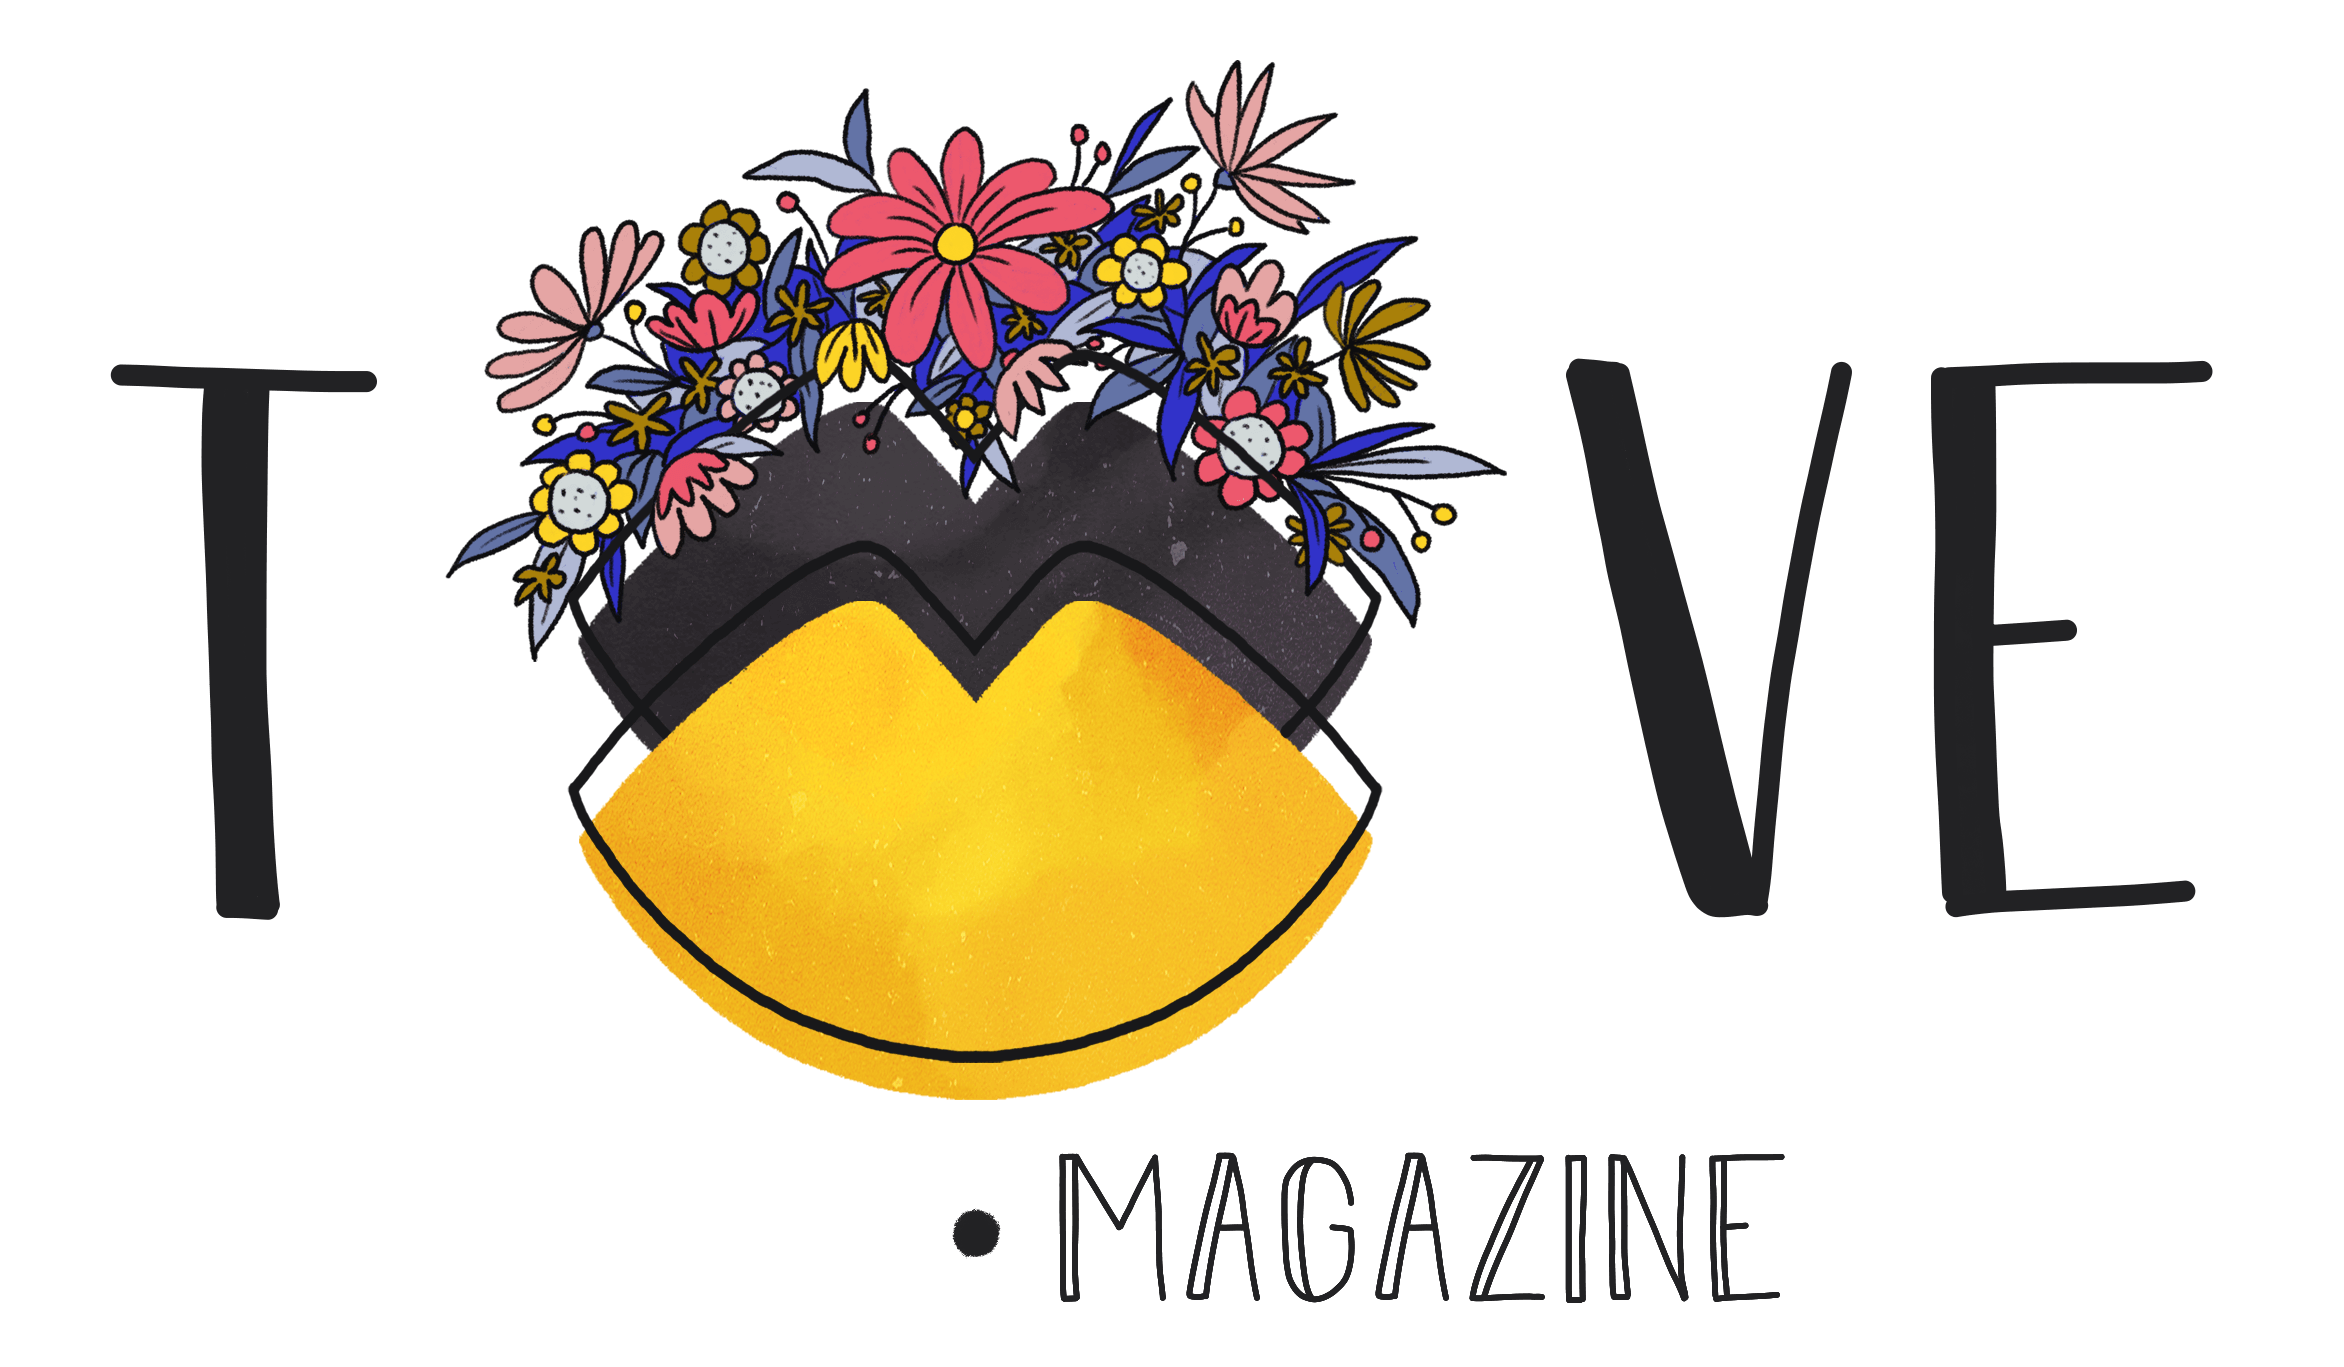 Tove Magazine